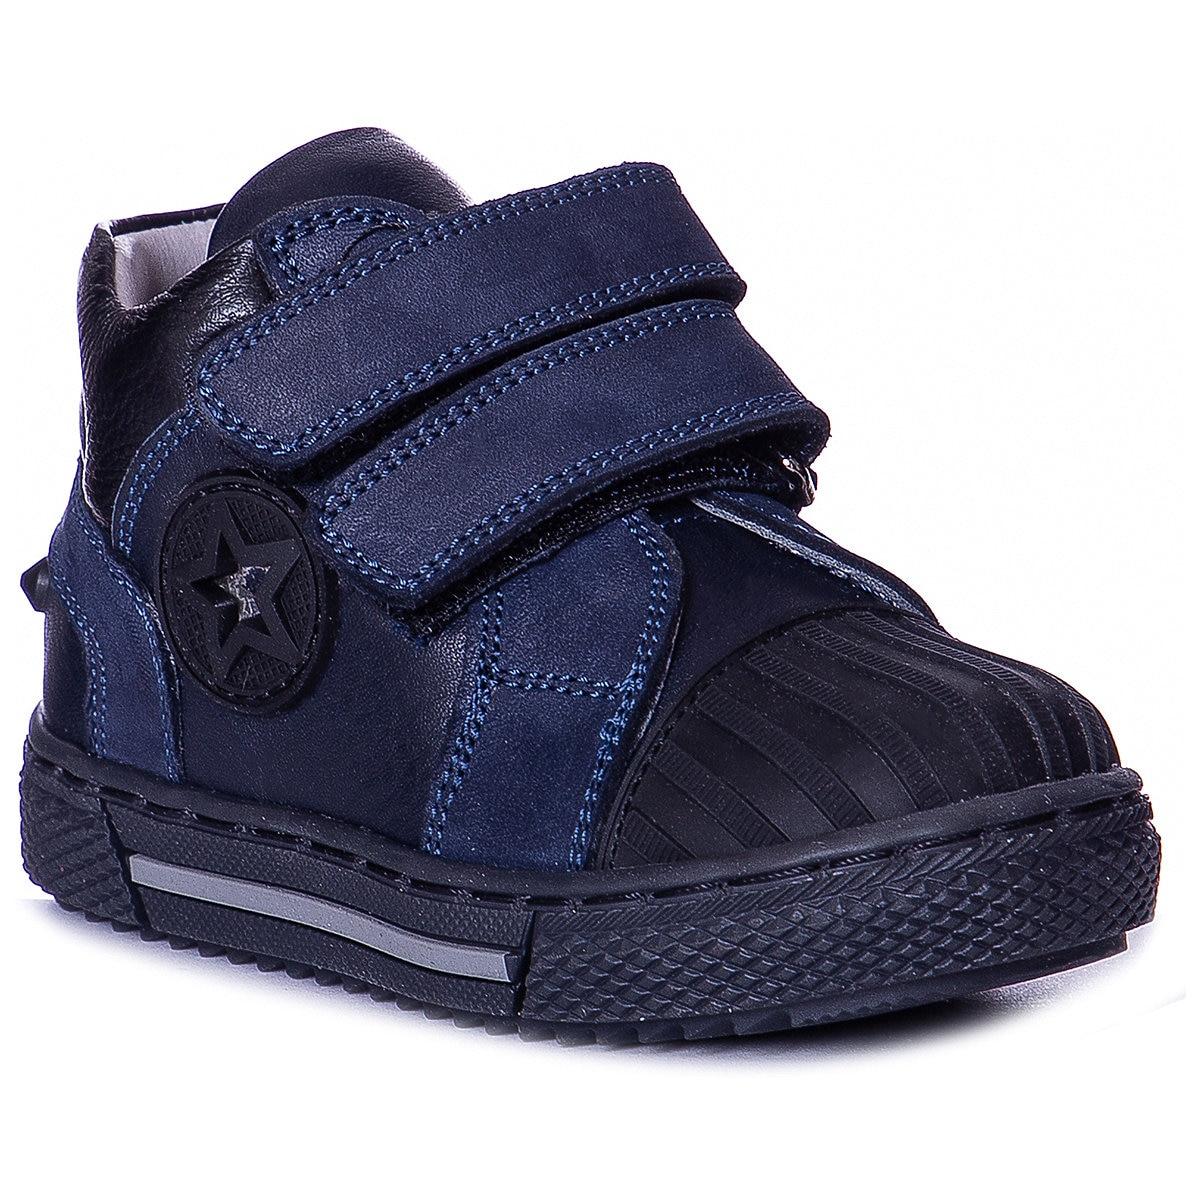 TIFLANI Kids' Sneakers 10924883 Shoes Baby Children Footwear Sport Blue Boys Spring/Autumn